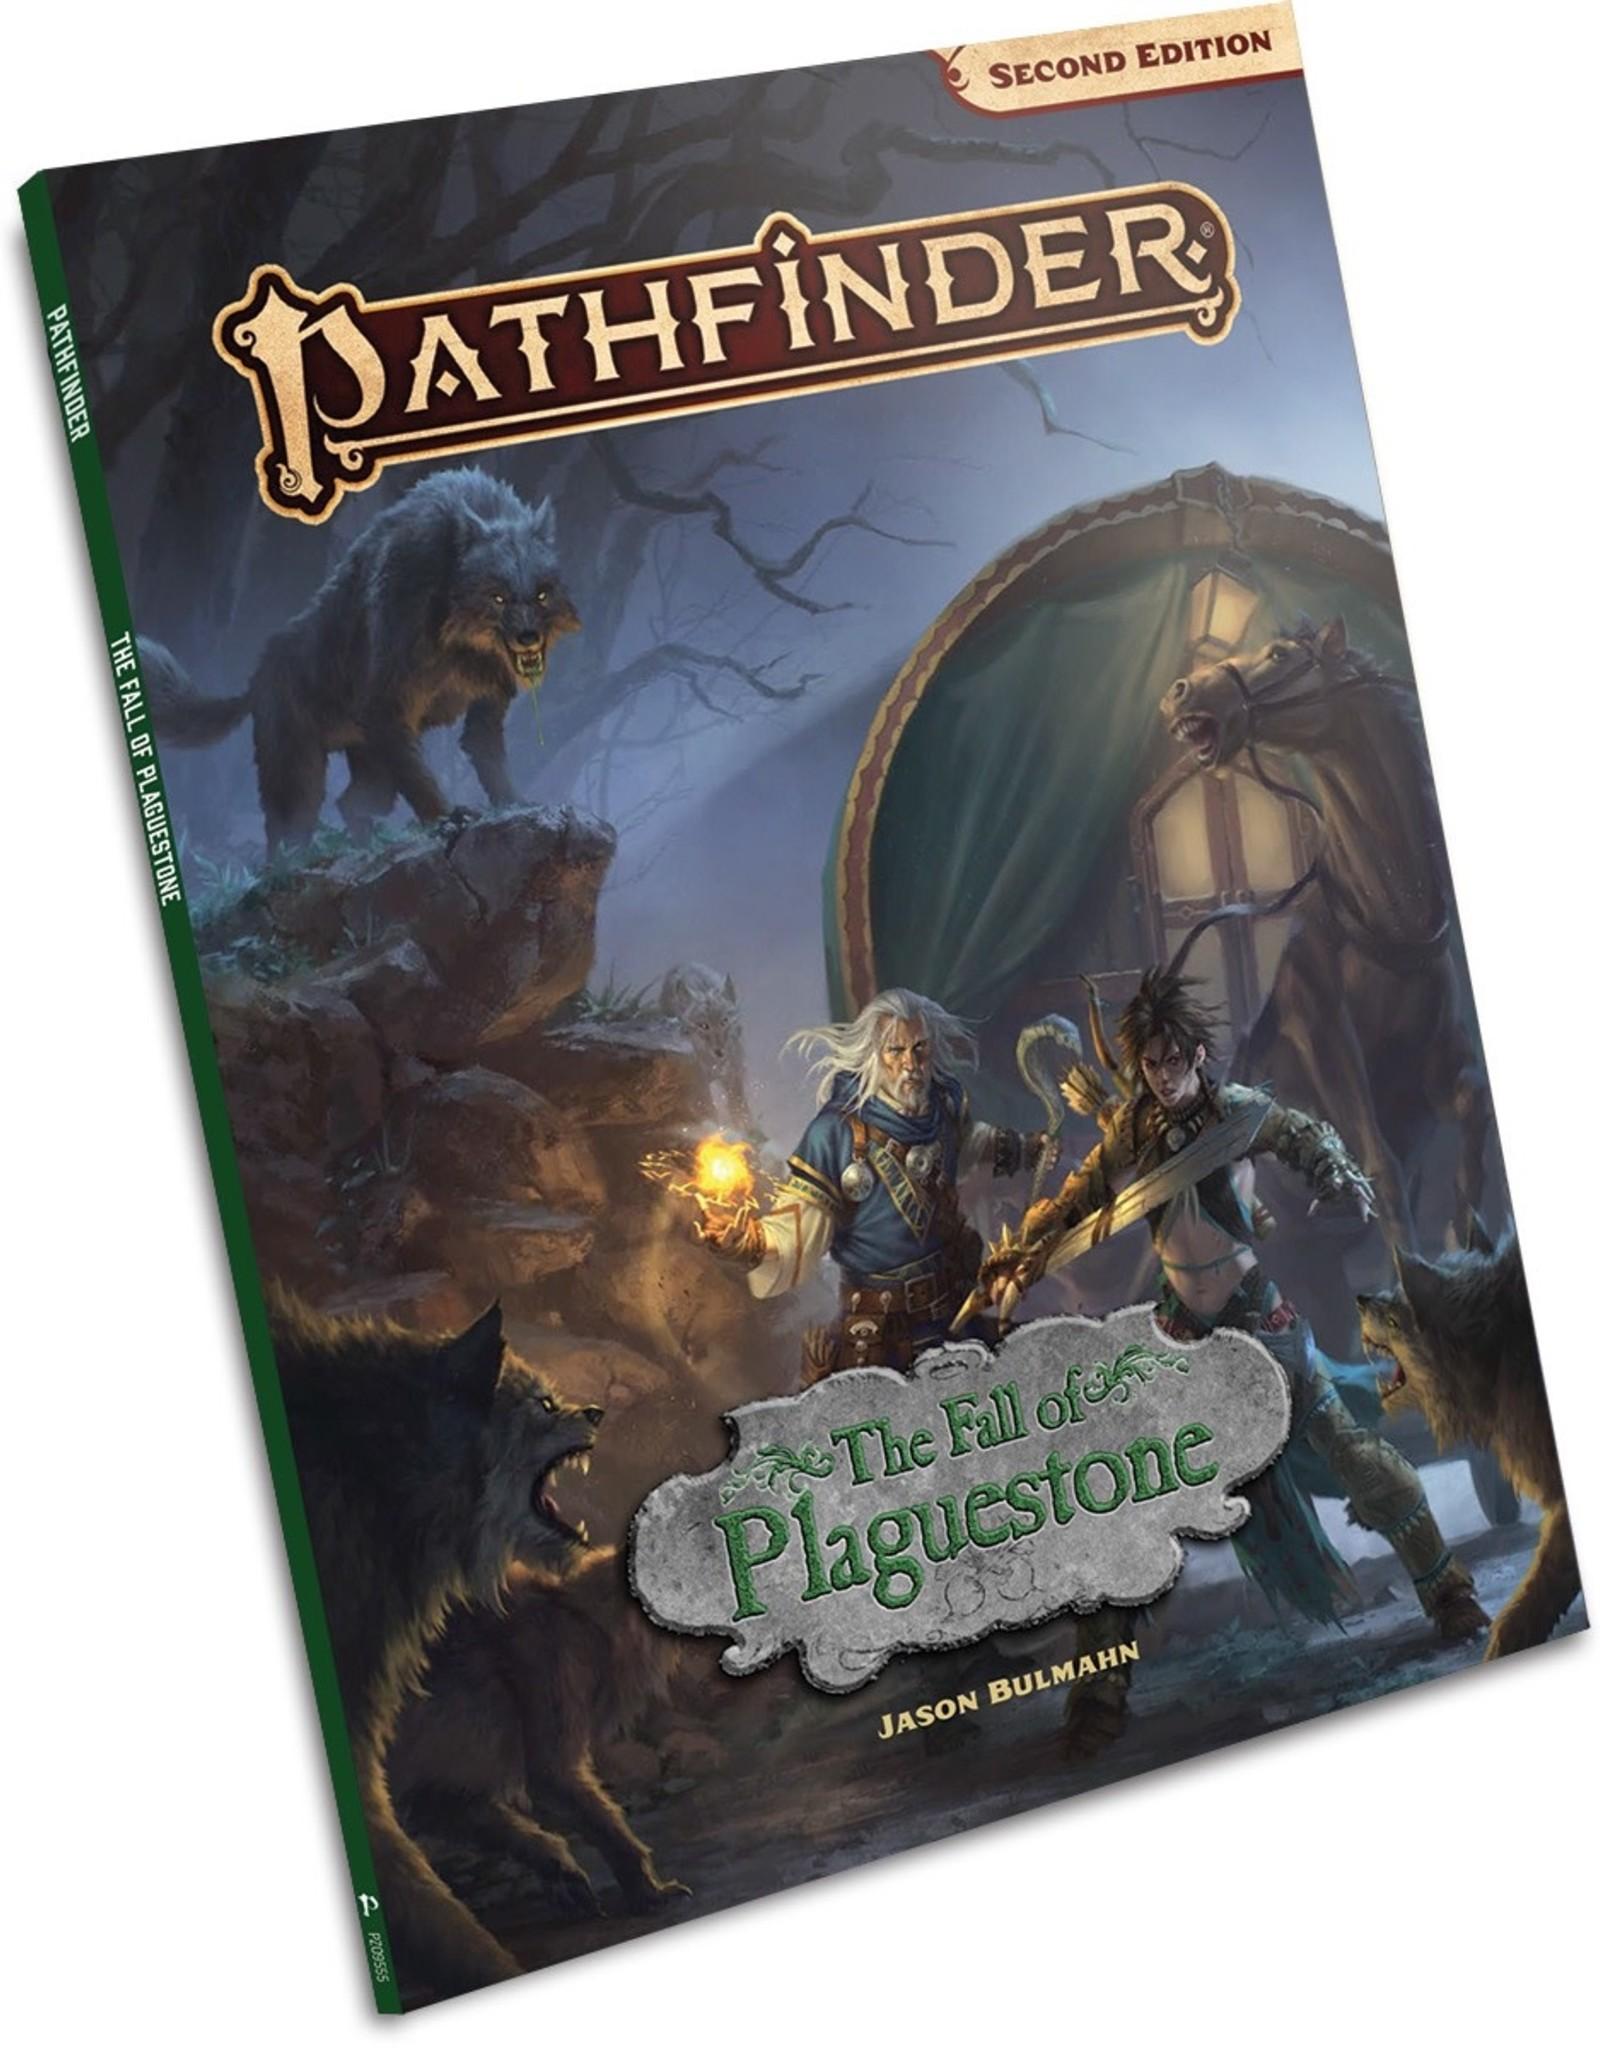 Paizo Publishing Pathfinder 2nd Edition Adventurer: Fall of Plaguestone